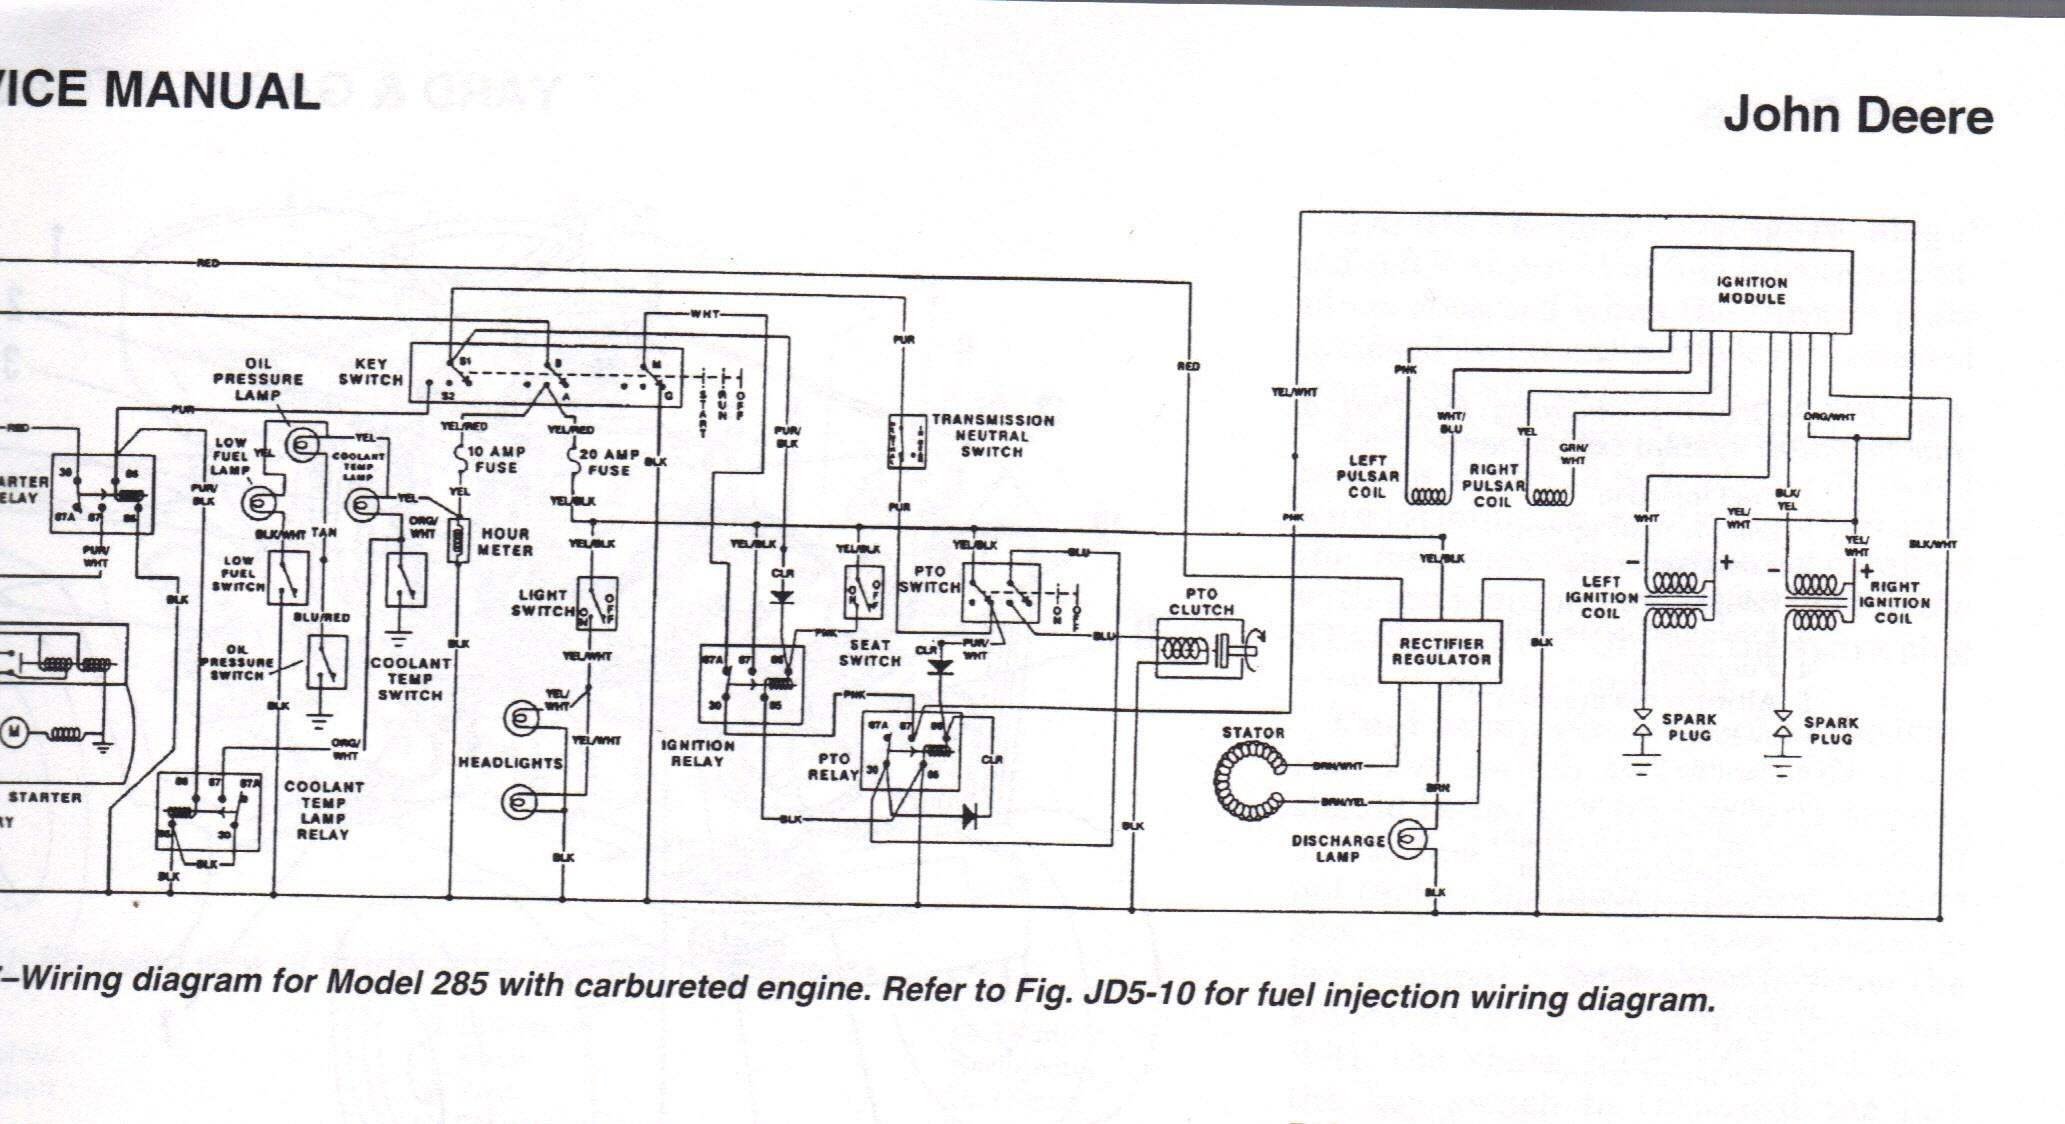 John Deere 318 Wiring Diagram Pdf Ww 1570] for John Deere 1050 Tractor Wiring Diagram Free Diagram Of John Deere 318 Wiring Diagram Pdf 56d25 John Deere 655 Wiring Diagram